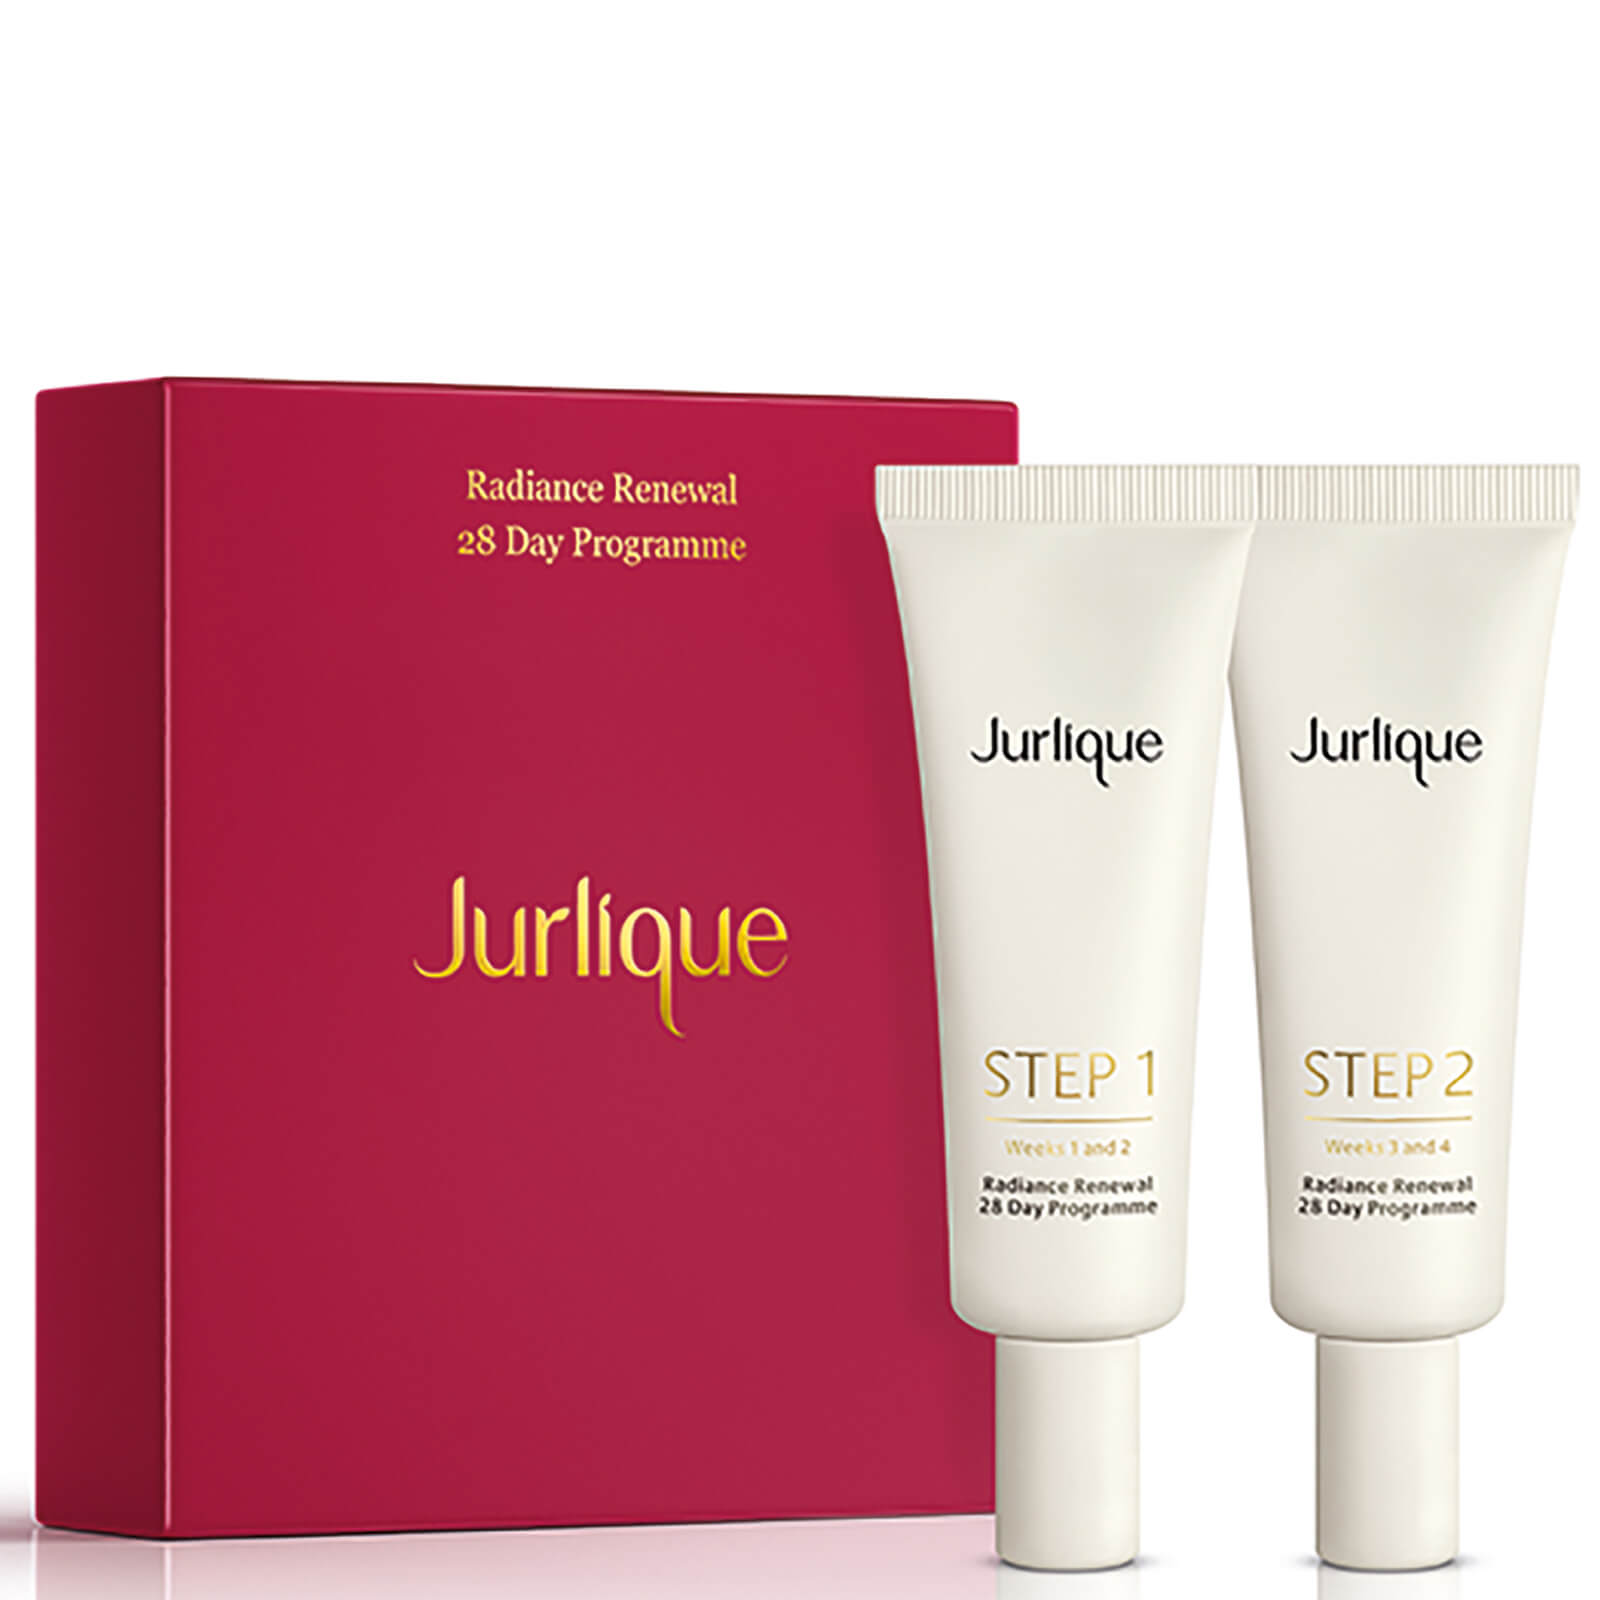 Jurlique Radiance Renewal 28 Day Programme Beautyexpert Austin Flats Rene Maroon 40 Product Description